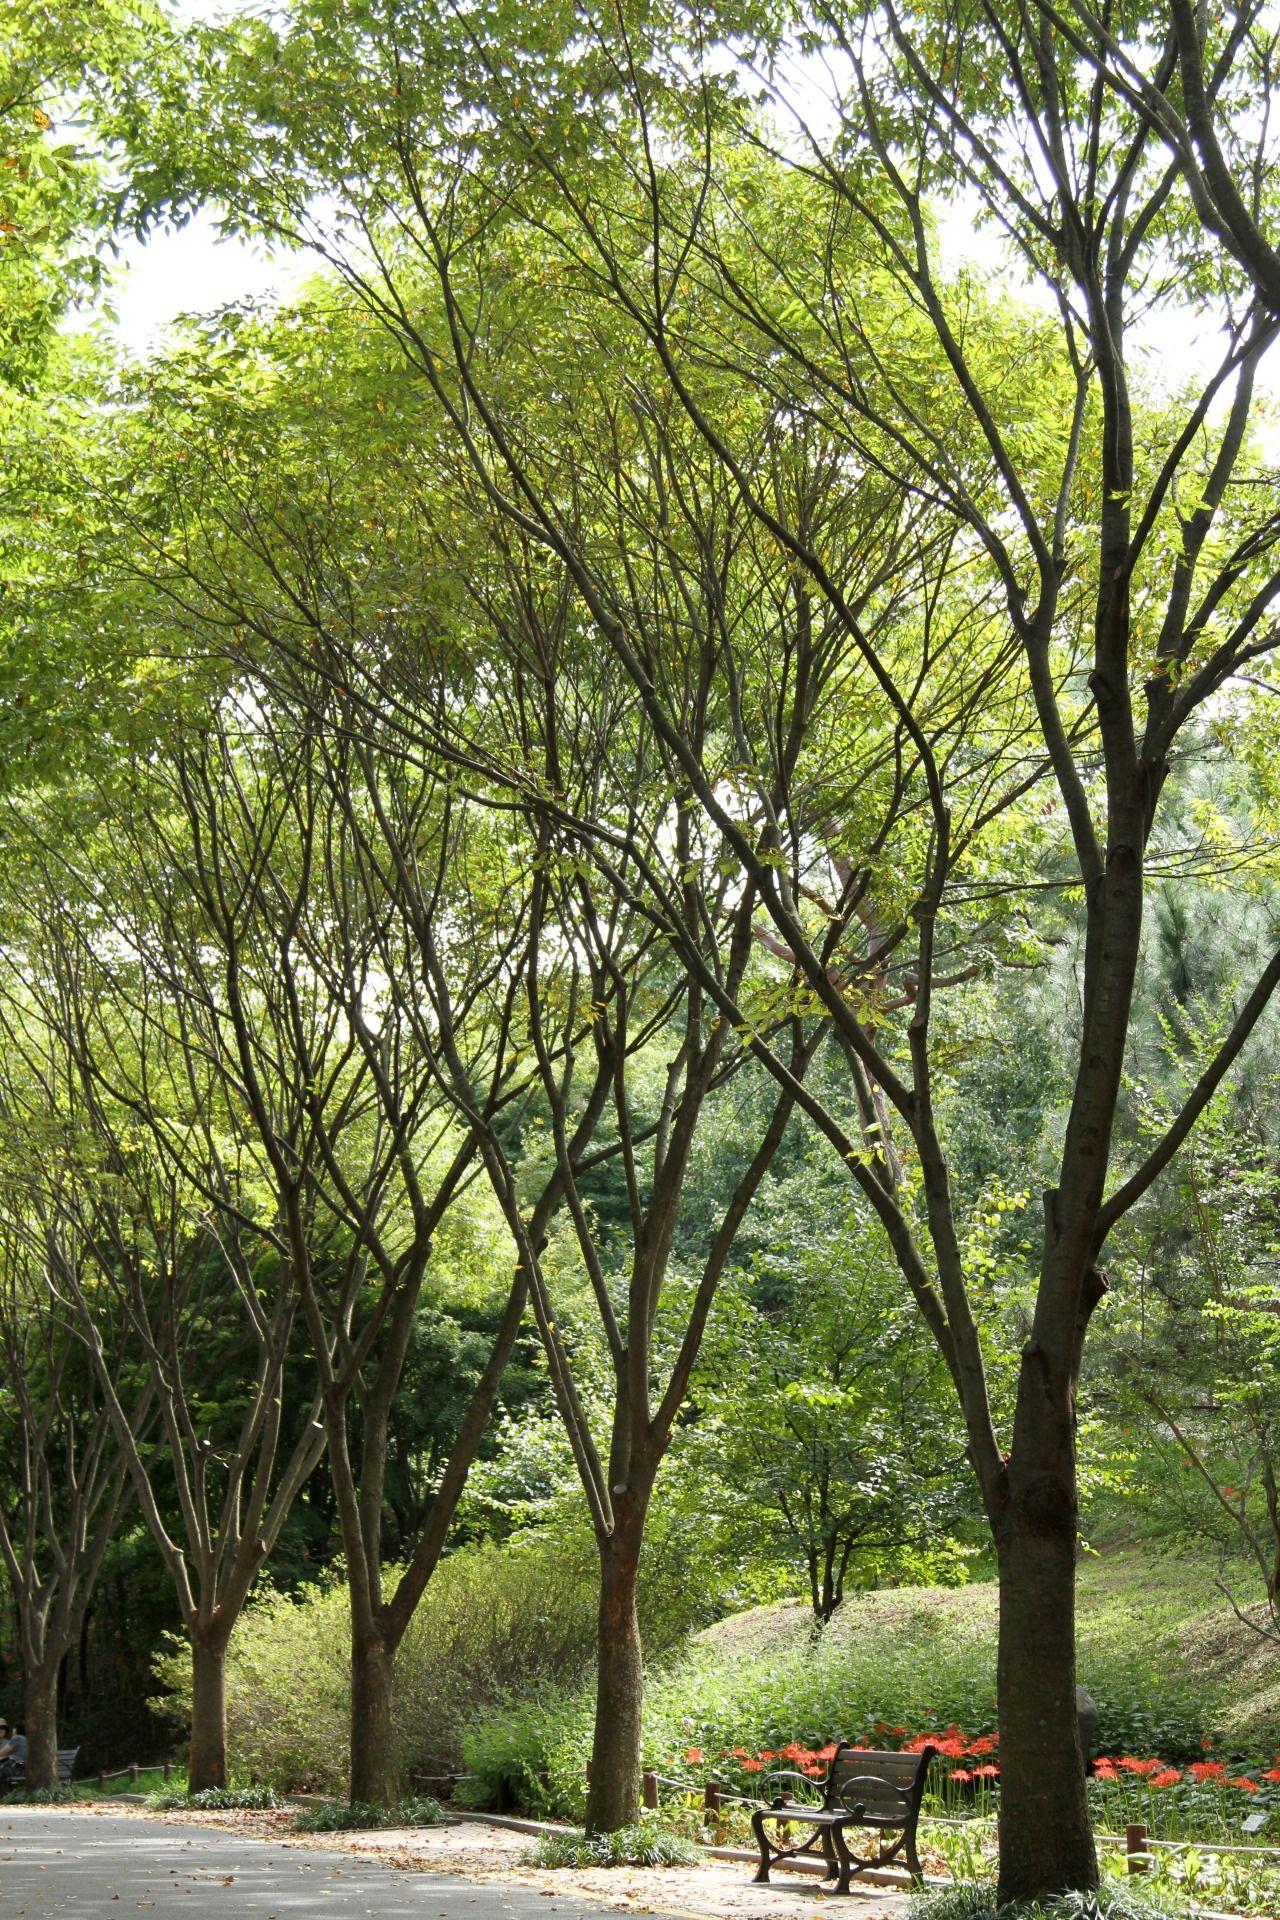 Daegu Arboretum, Daegu, South Korea (2014) Lindsay Mickles Photography www.theneverendingwanderlust.blogspot.com #그대로에집엄마를 #네트워크마케팅 #다단계마케팅 #피부관리 #ClassyLadyEntrepreneur www.RadiantFitAndHappy.com ⭐️⭐️ www.SkincareInKorea.info